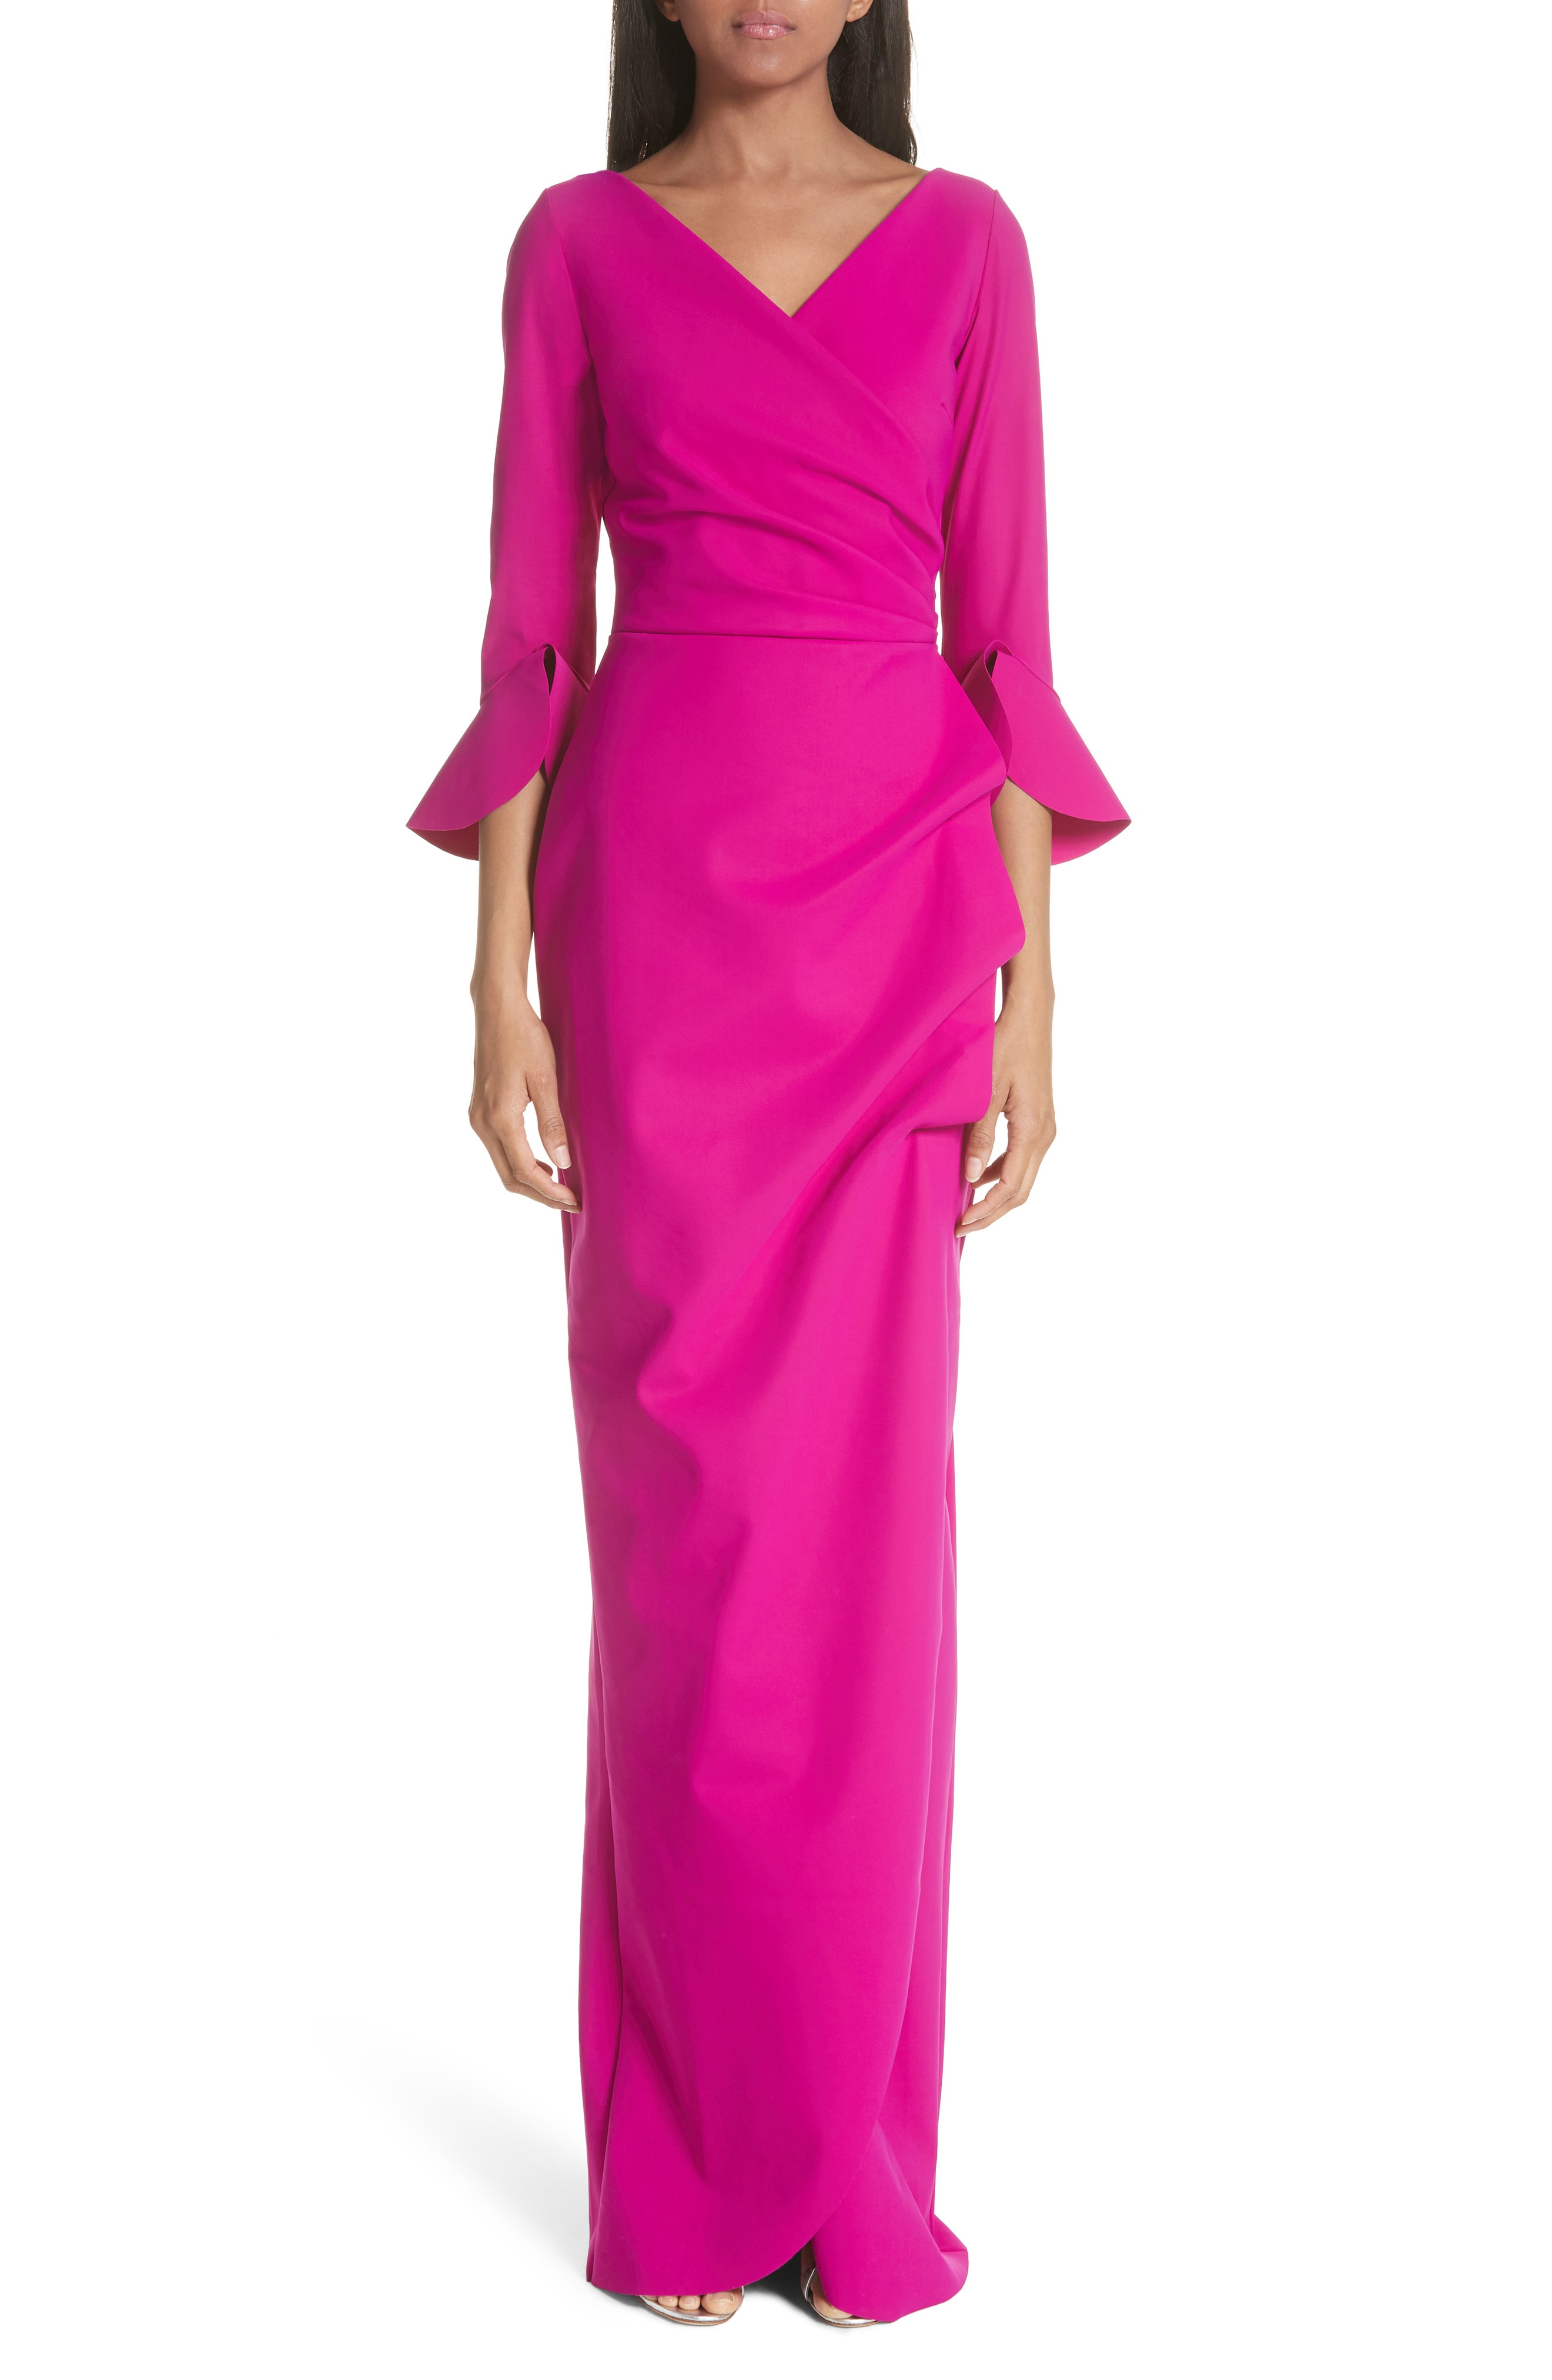 Chiara Boni La Petite Robe Ruffle Cuff Side Drape Gown